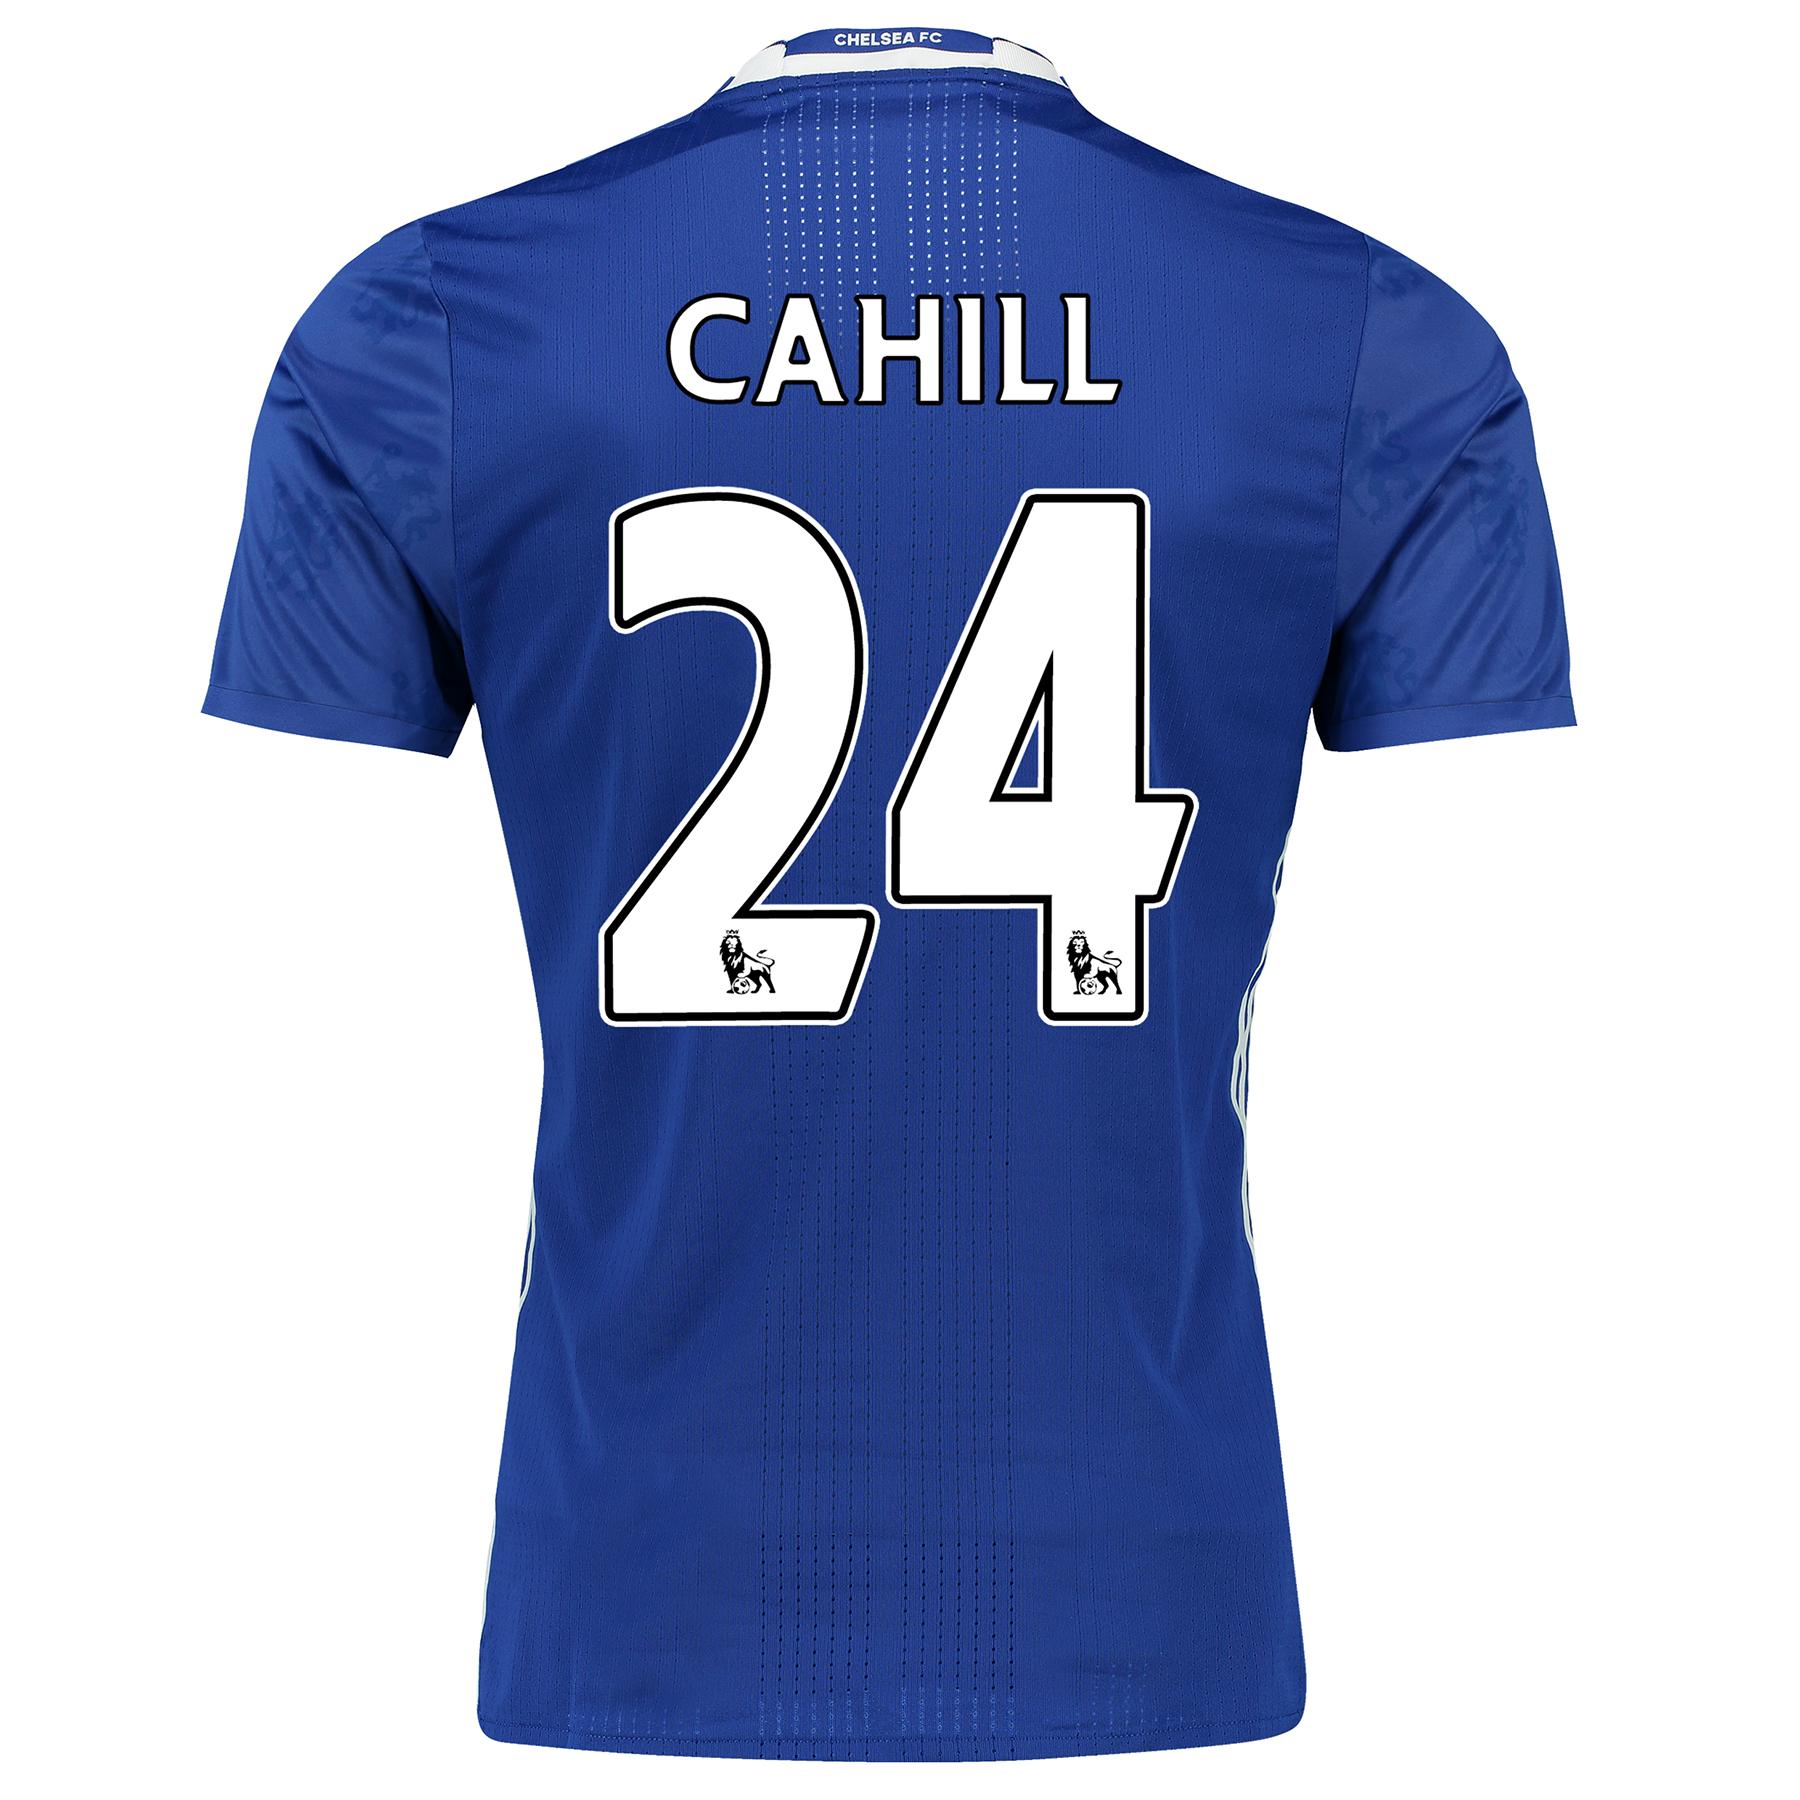 Chelsea Home Adi Zero Shirt 2016-17 with Cahill 24 printing